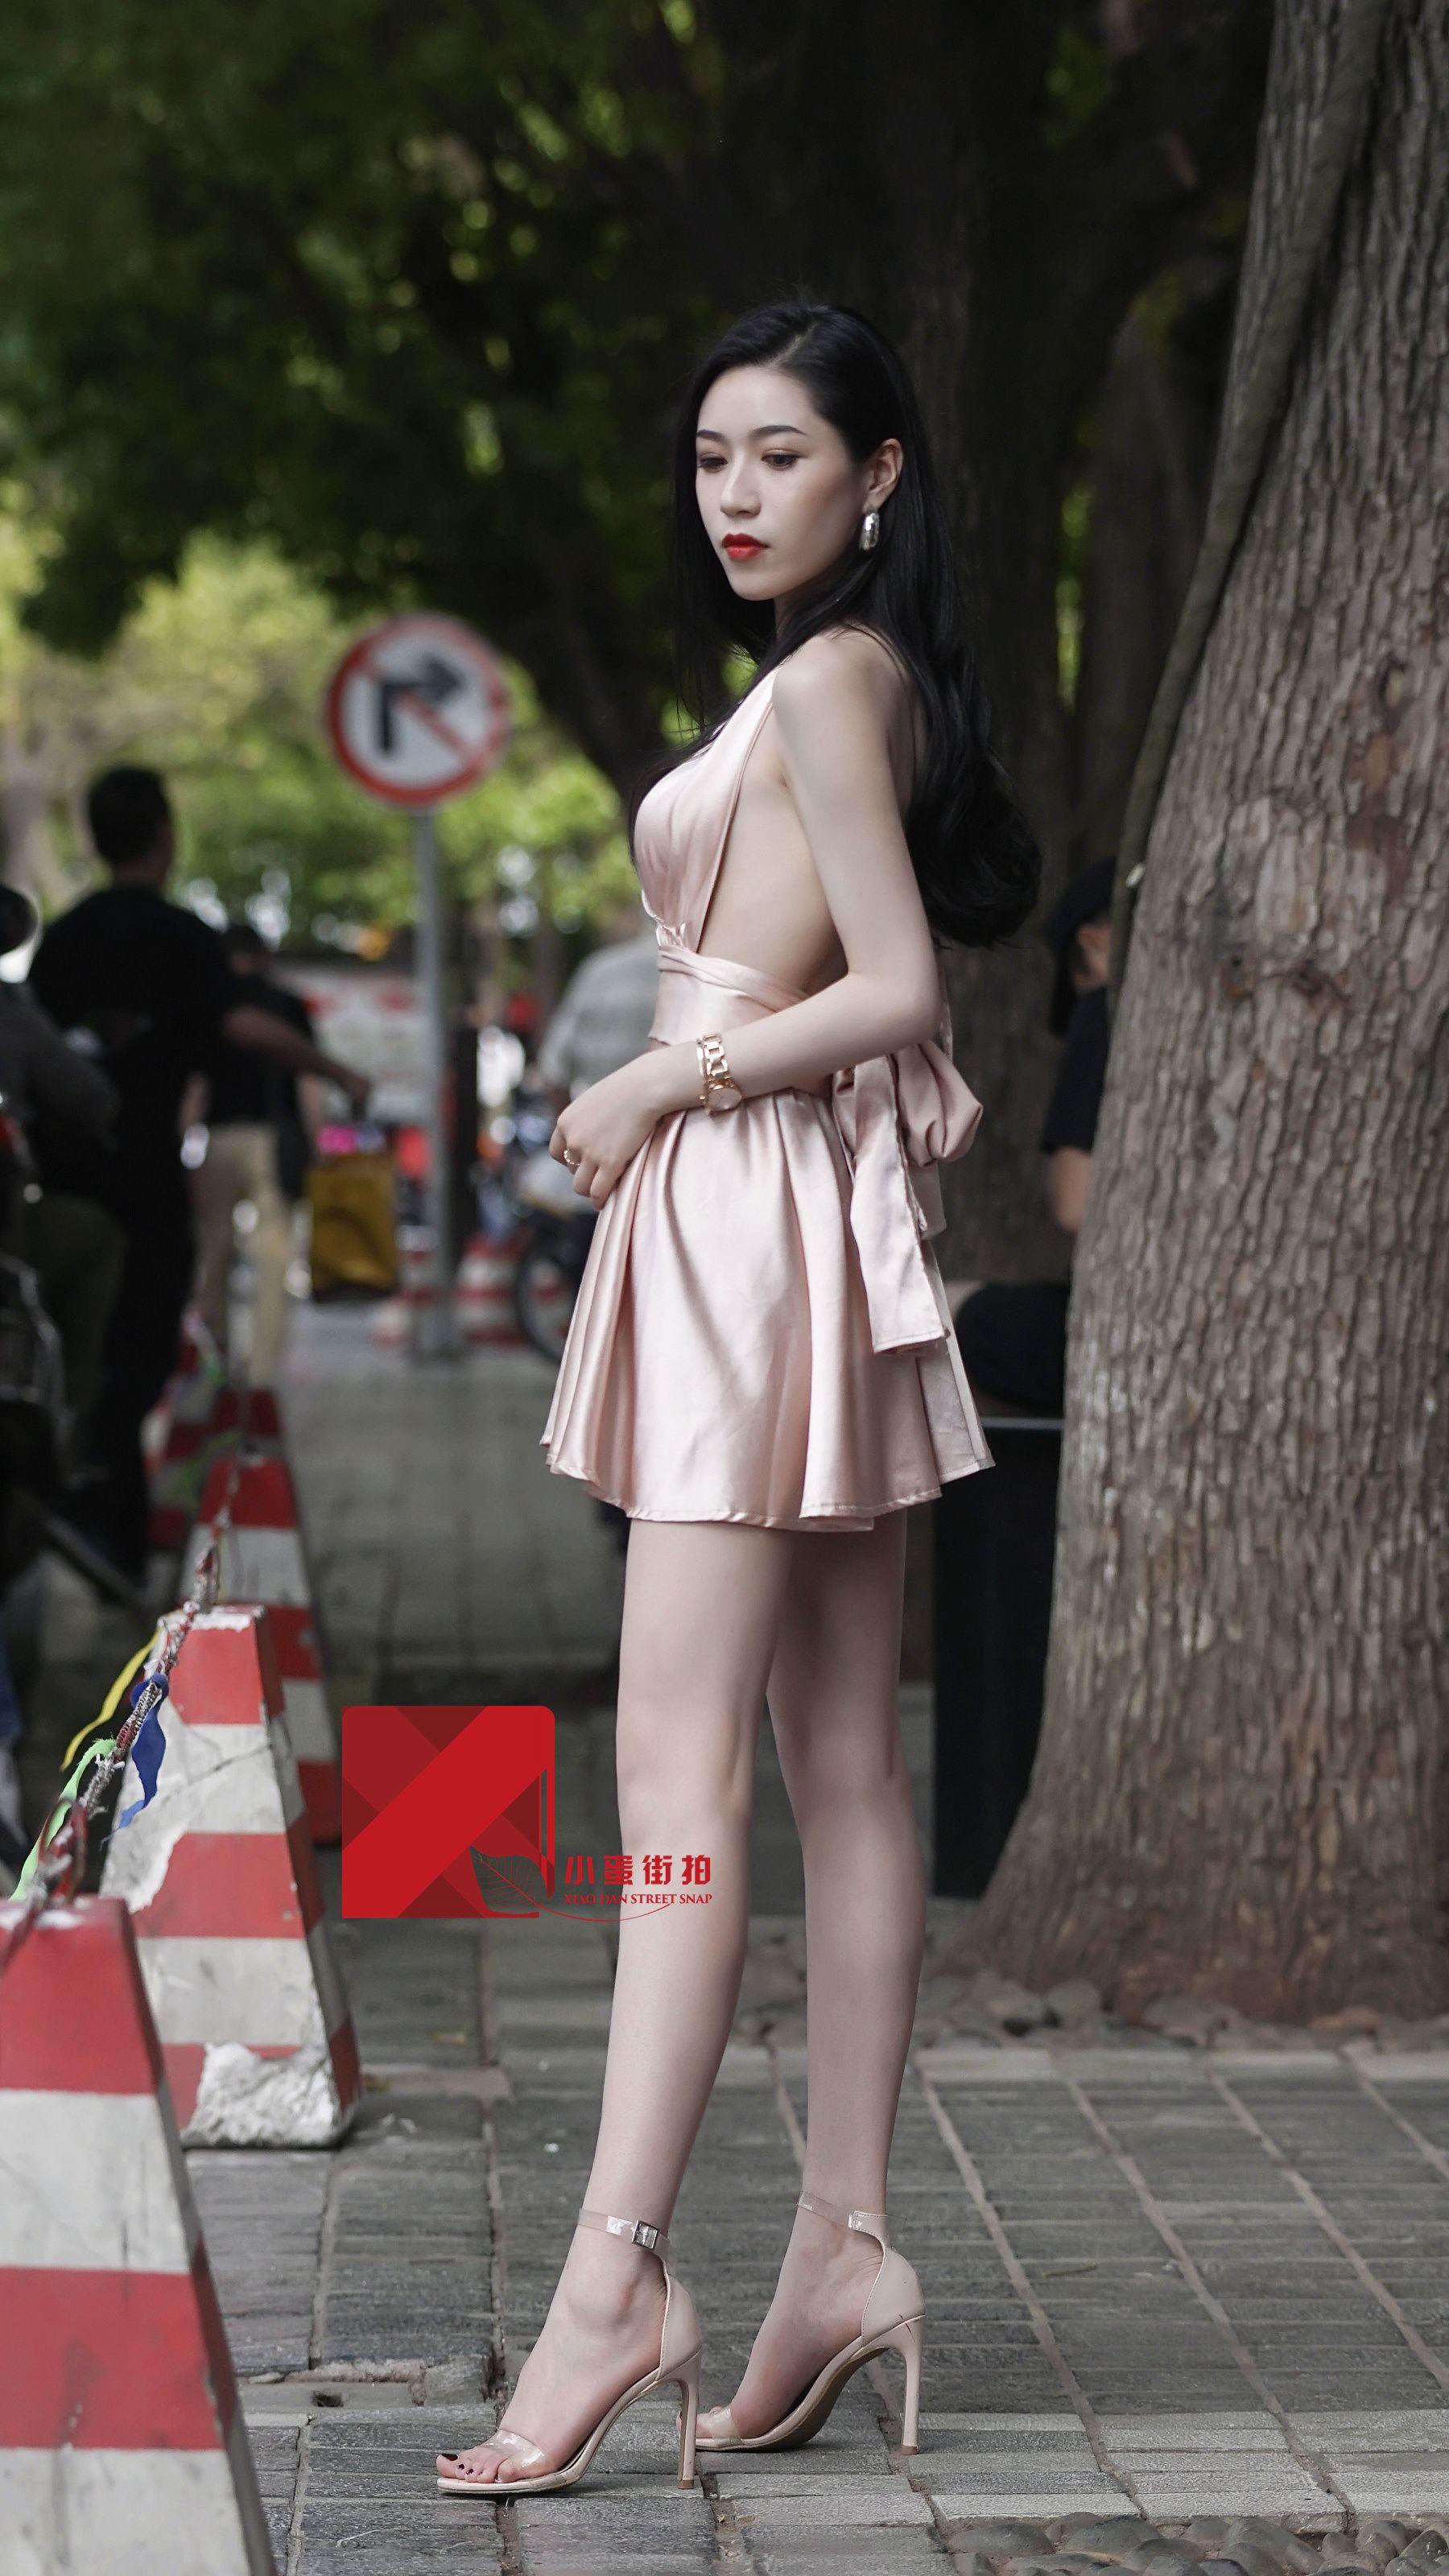 Chinese babe strip